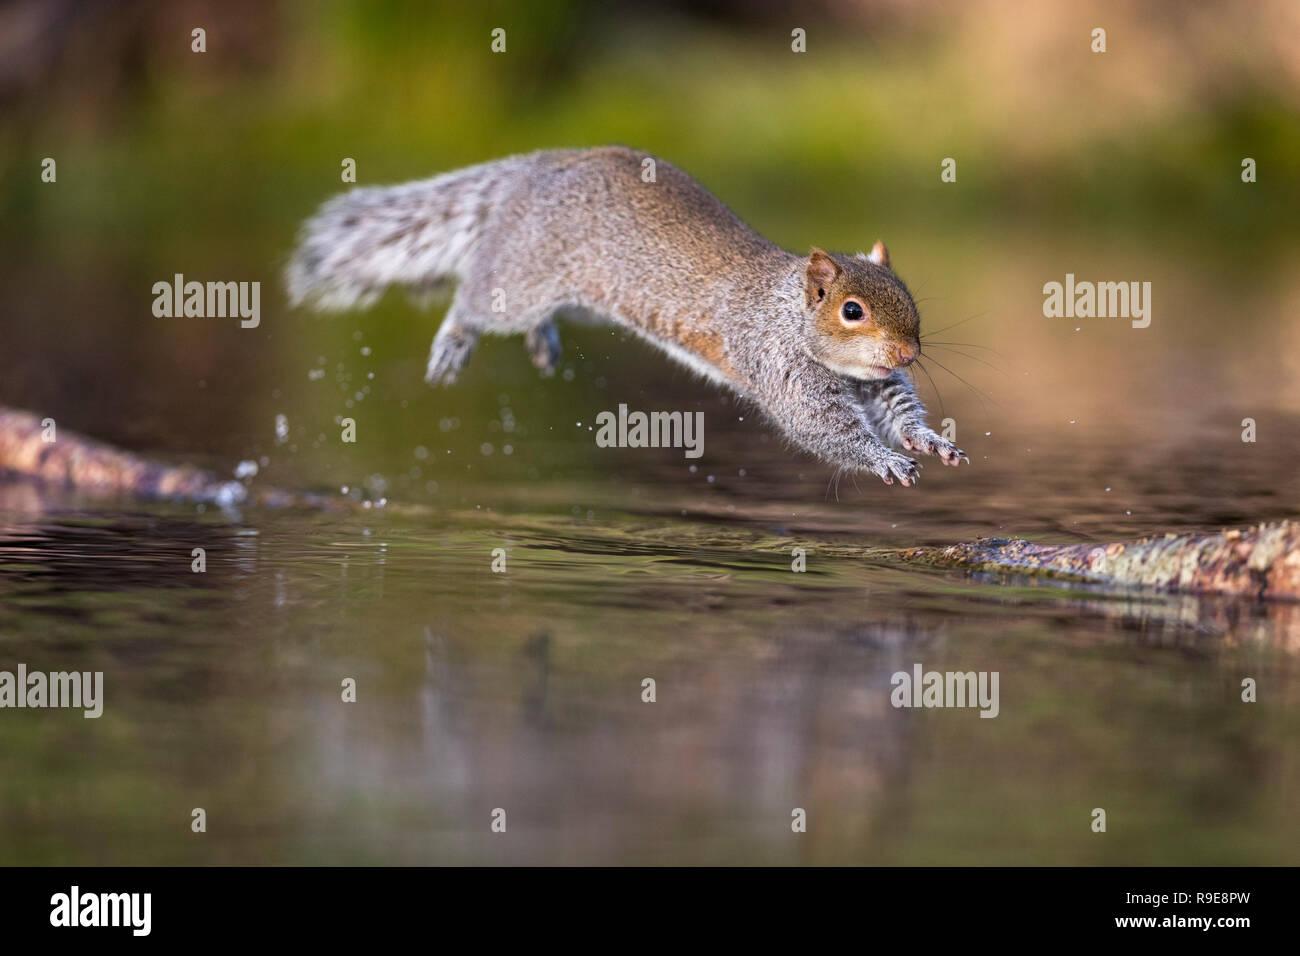 Grey Squirrel; Sciurus carolinensis Single Jumping Cornwall; UK - Stock Image